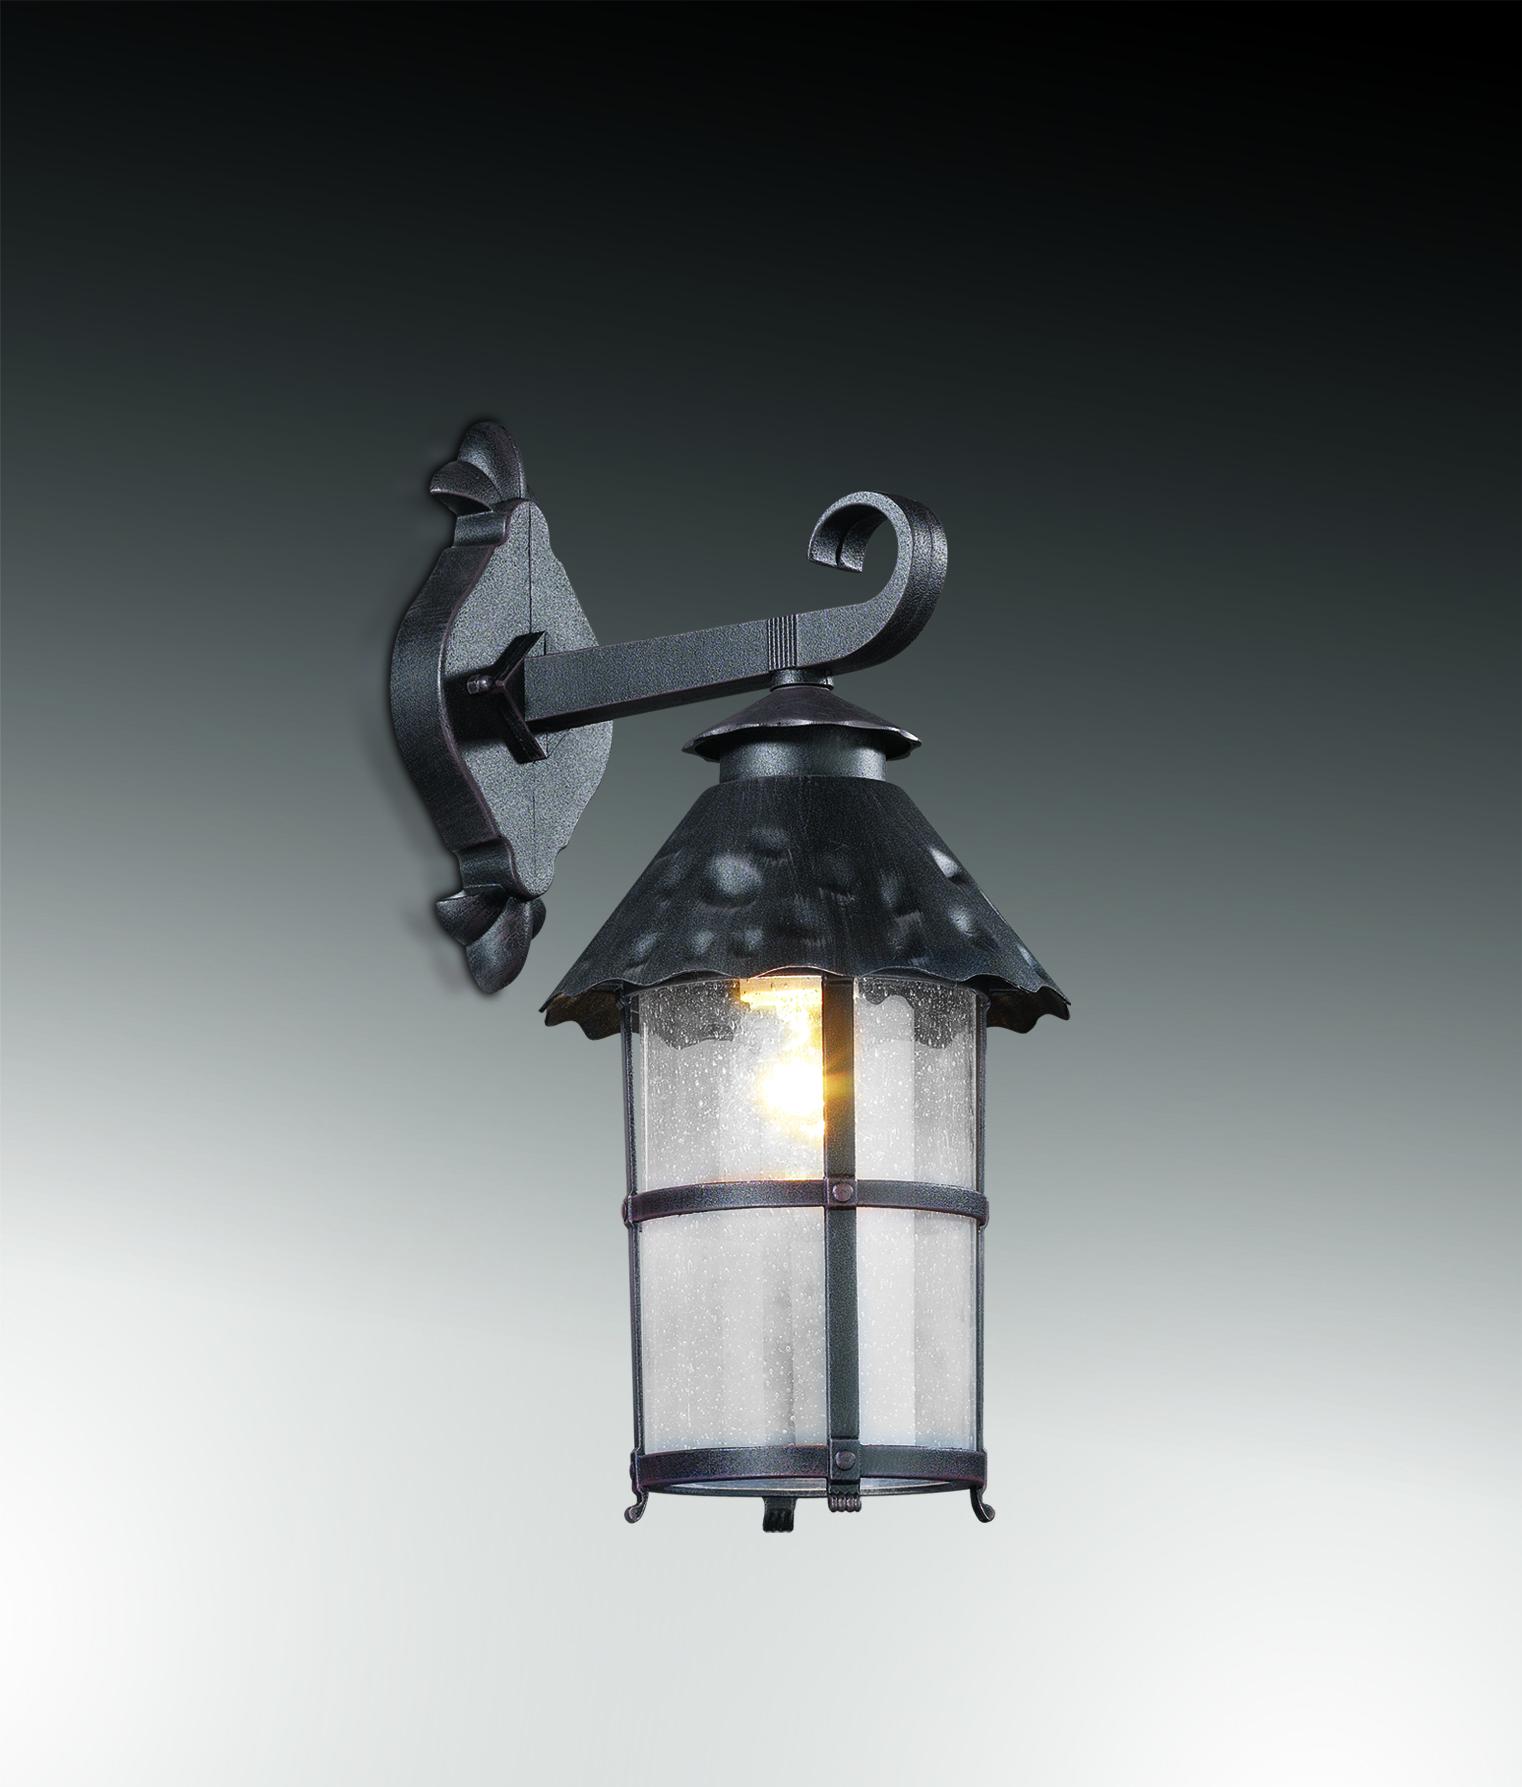 Настенный фонарь Odeon Light Lumi 2313/1W, IP44, 1xE27x60W, коричневый, прозрачный, металл, стекло - фото 1